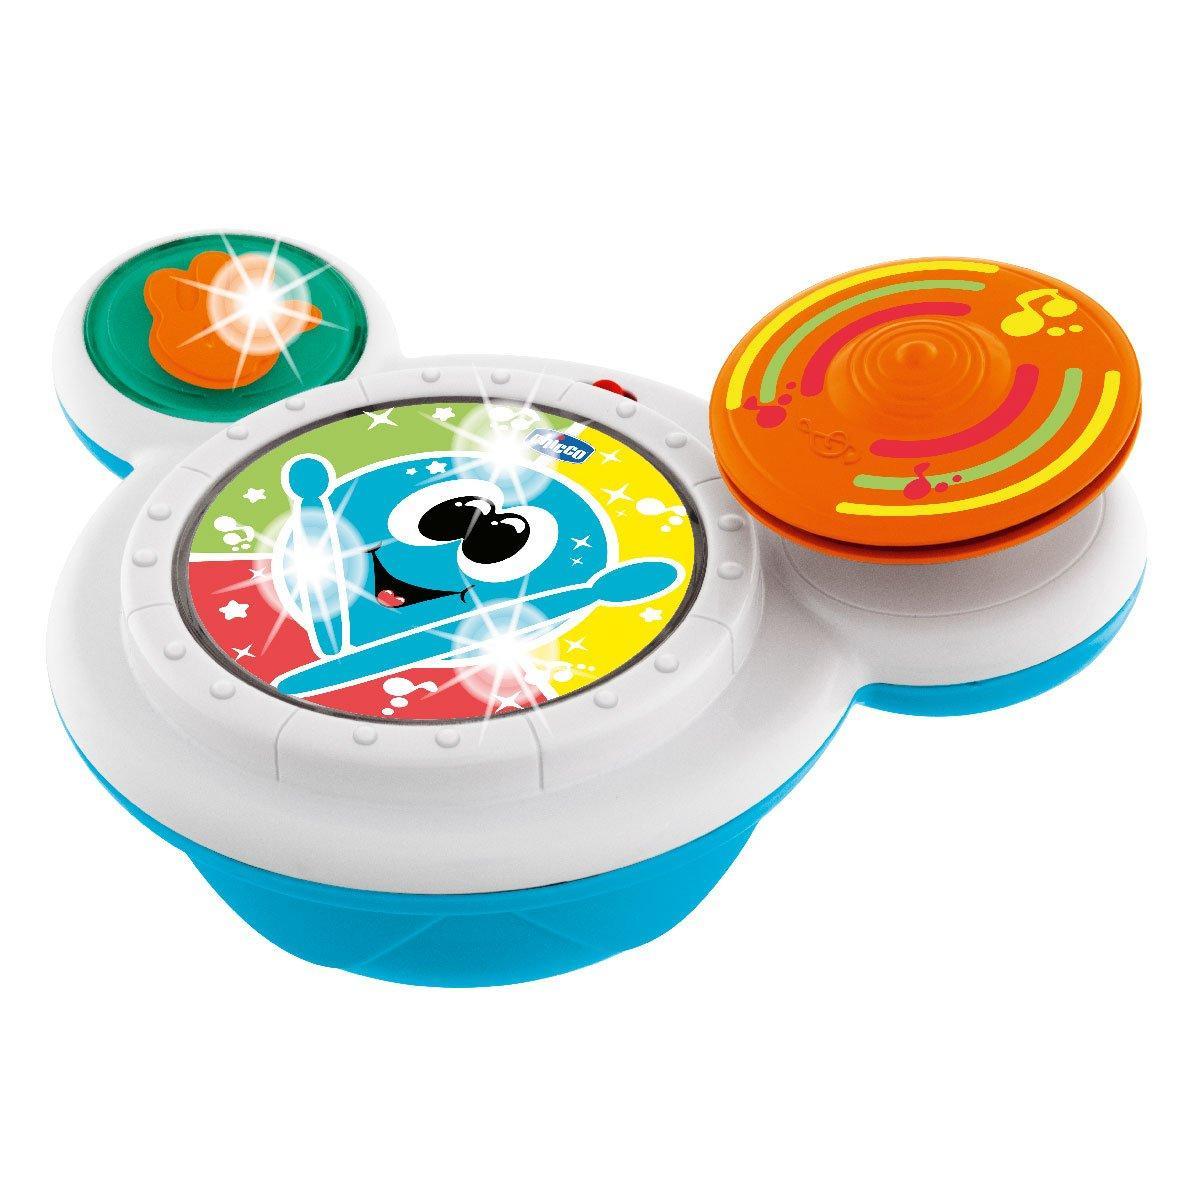 Іграшка музична Chicco Music Band Drum